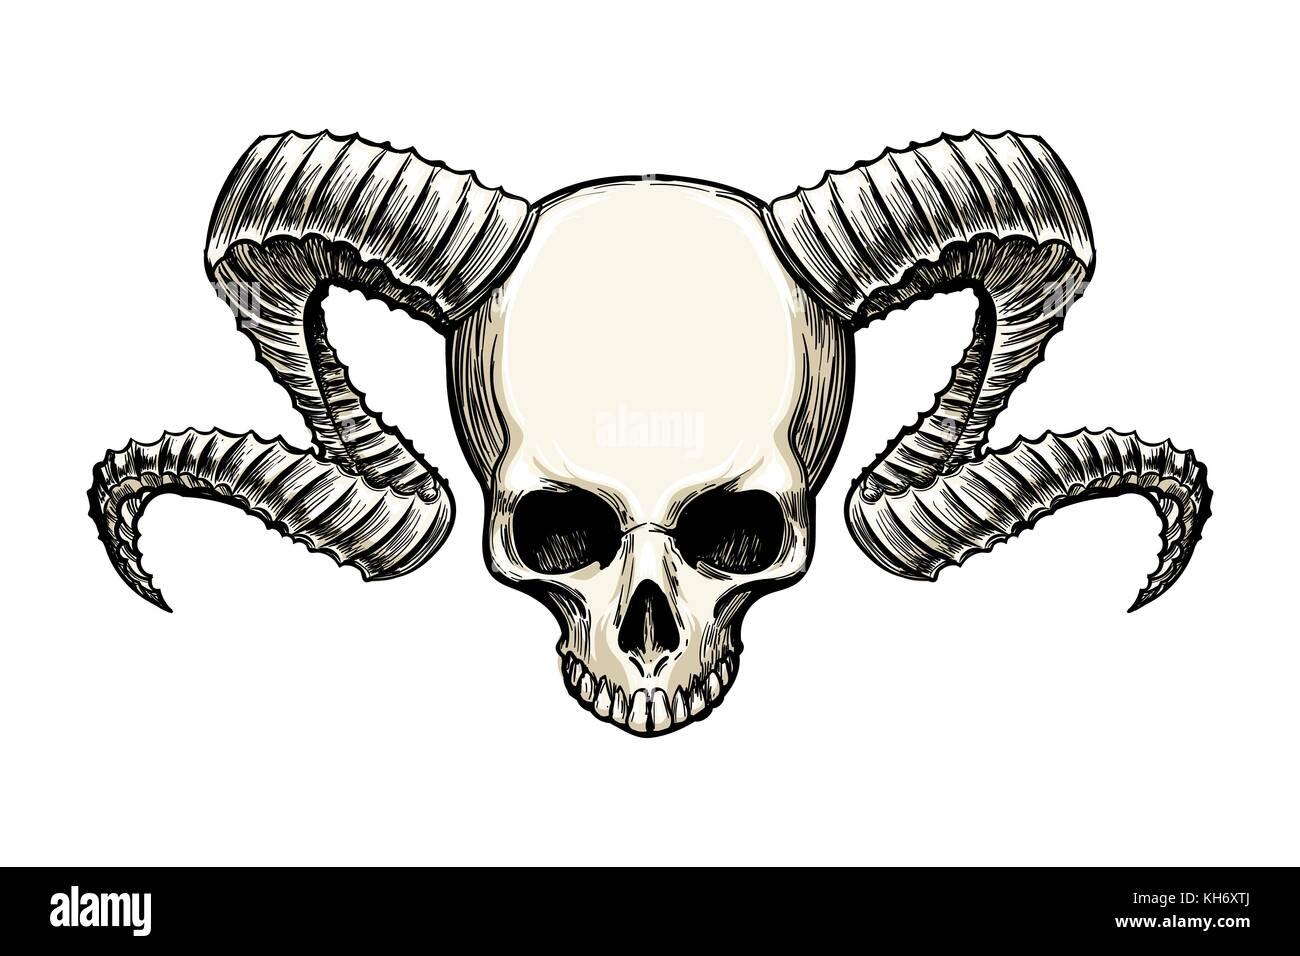 Cuernos De Diablo Png: Human Skull With Ram Horns Drawn In Sketh Tattoo Style